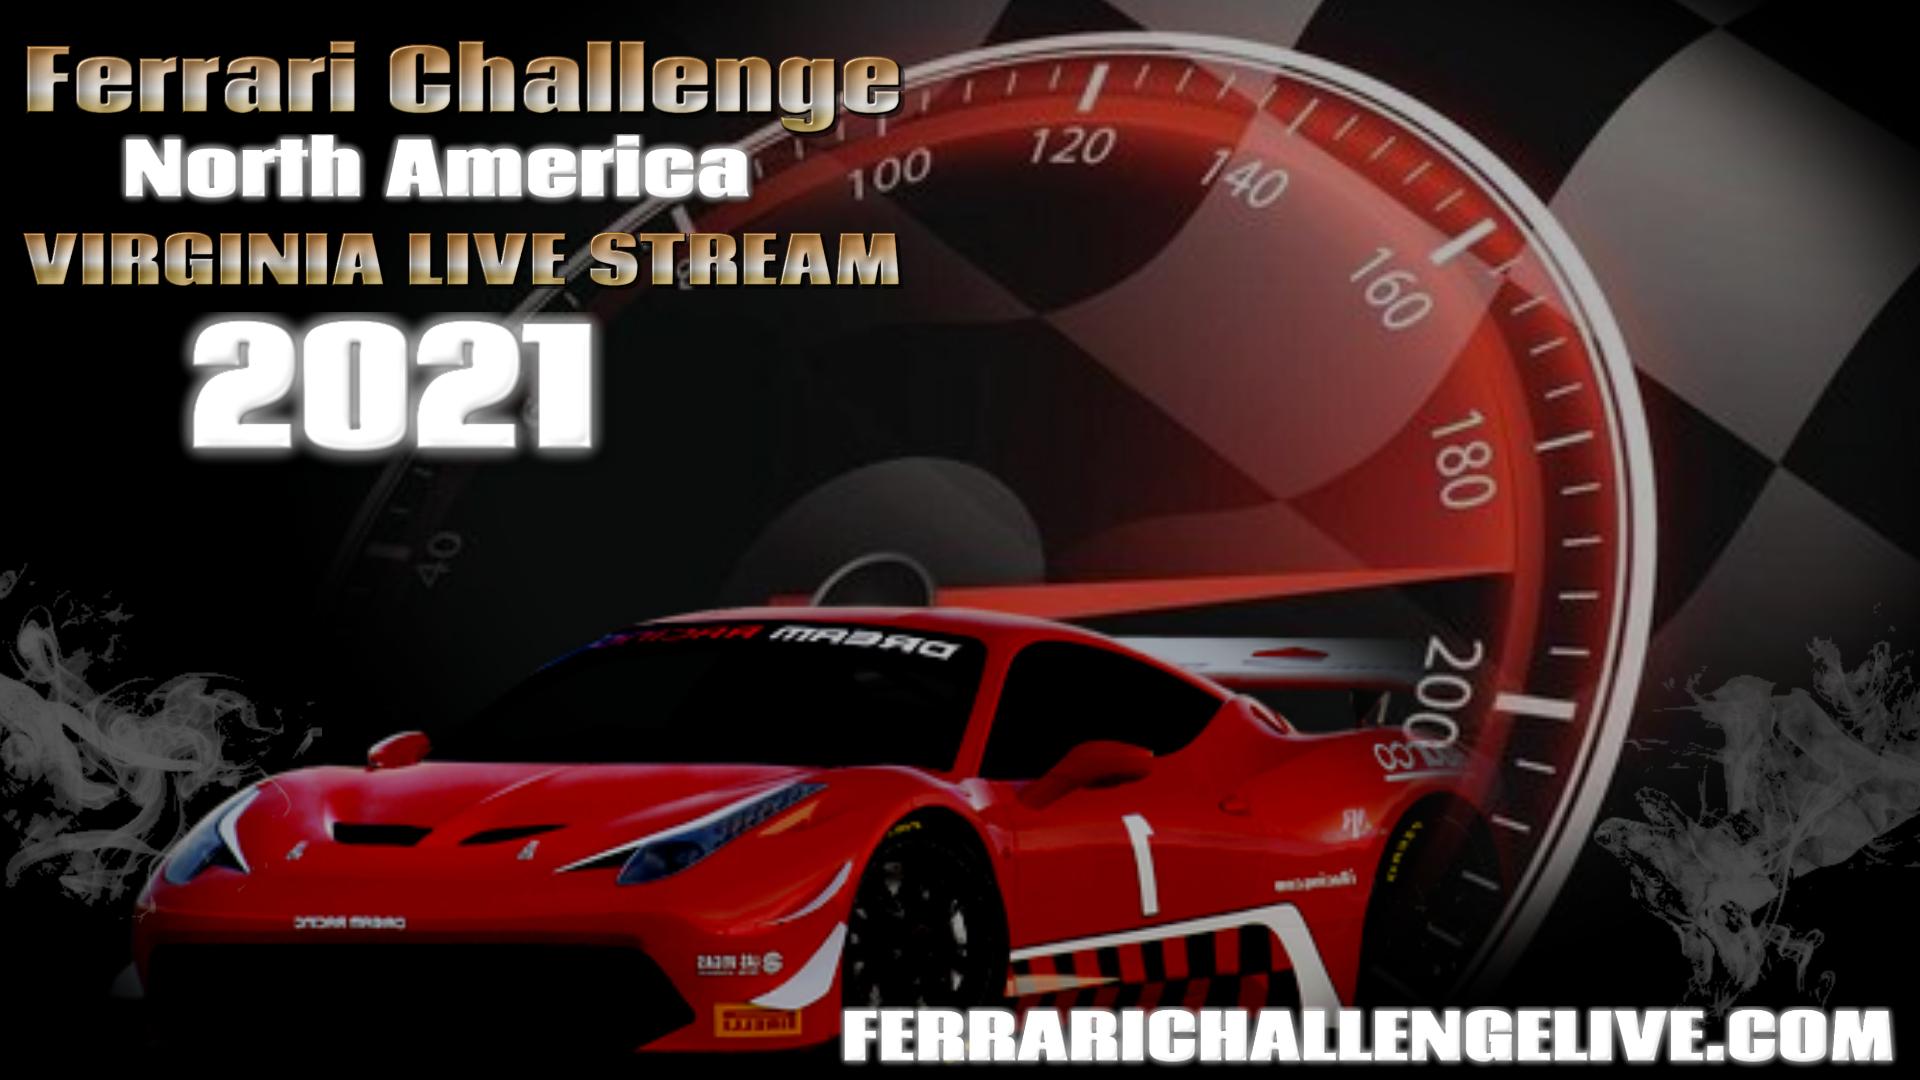 Virginia Ferrari Challenge Live Stream 2021